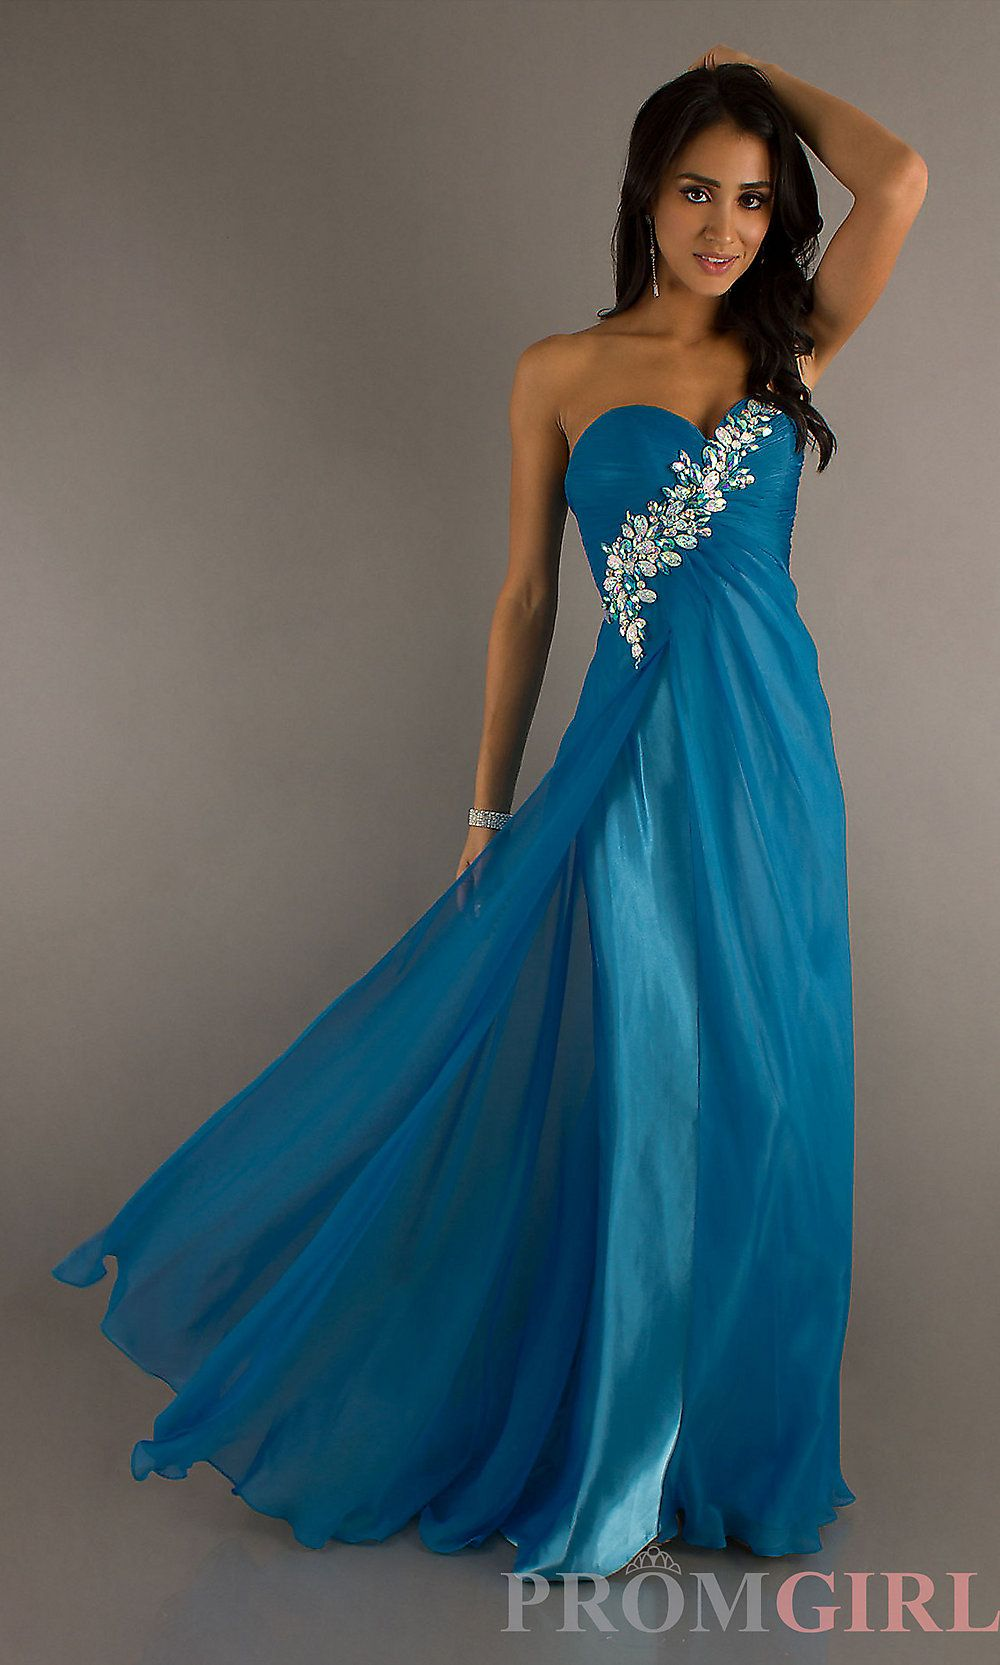 42321e0fec5f3 Prom Dresses, Evening Gowns - PromGirl: Strapless Sweetheart Blush Dress  9513